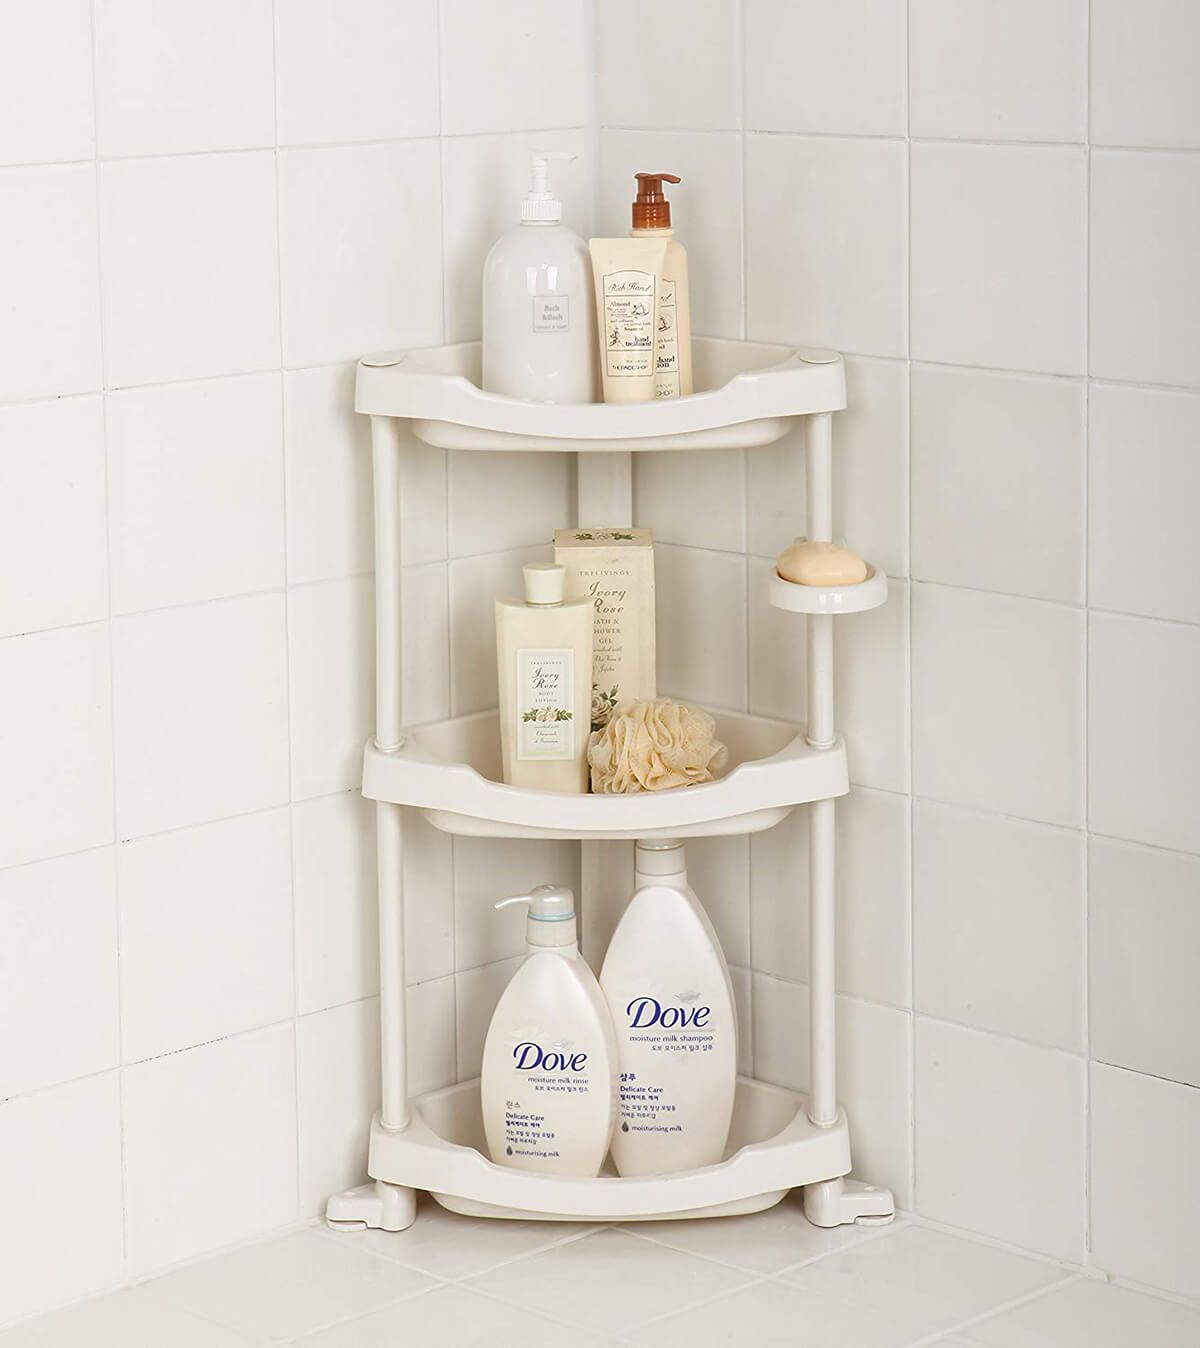 10 Small Bathroom Storage Ideas That Ll Improve Your Space Corner Shower Caddy Shower Organization Shower Shelves [ 1348 x 1200 Pixel ]